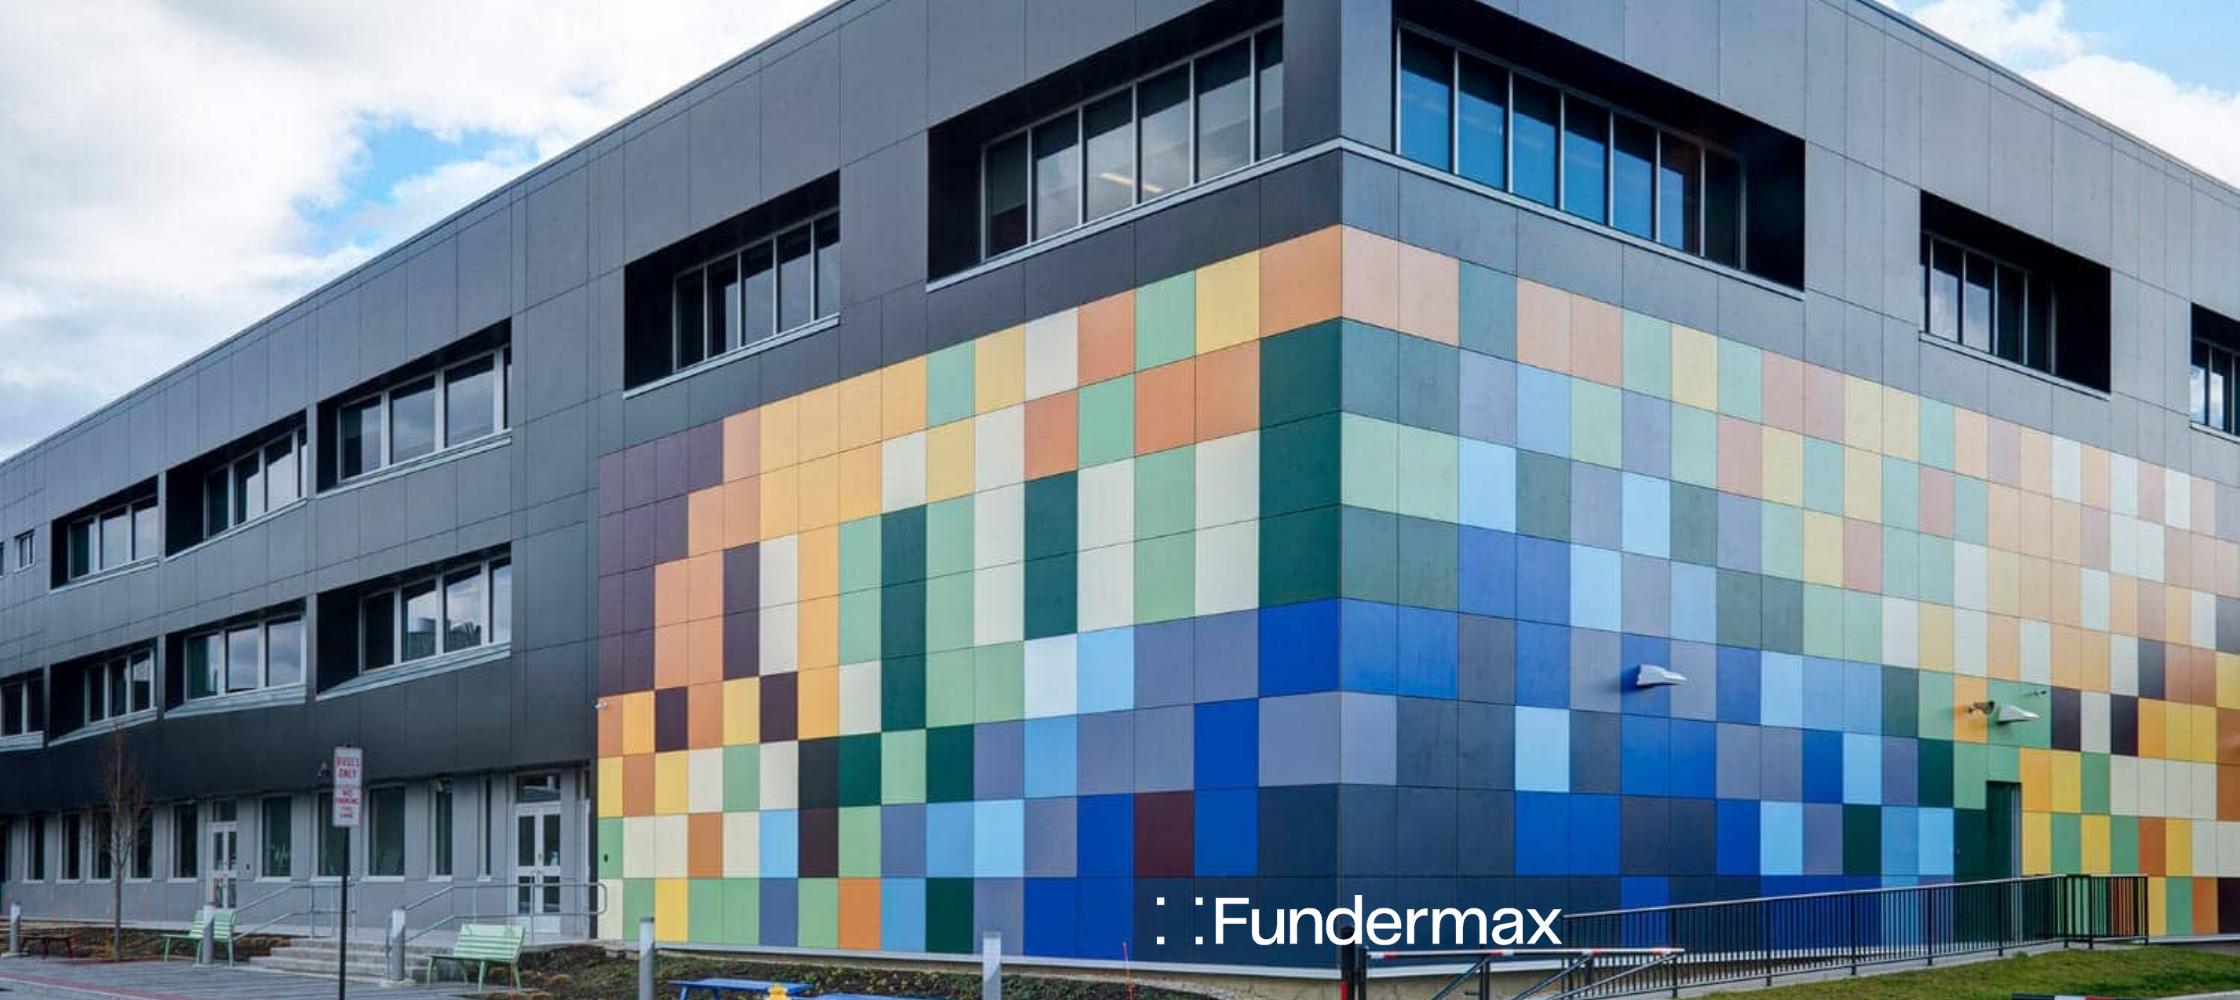 Longevity of HPL Panels: How Long do Fundermax Panels Last?